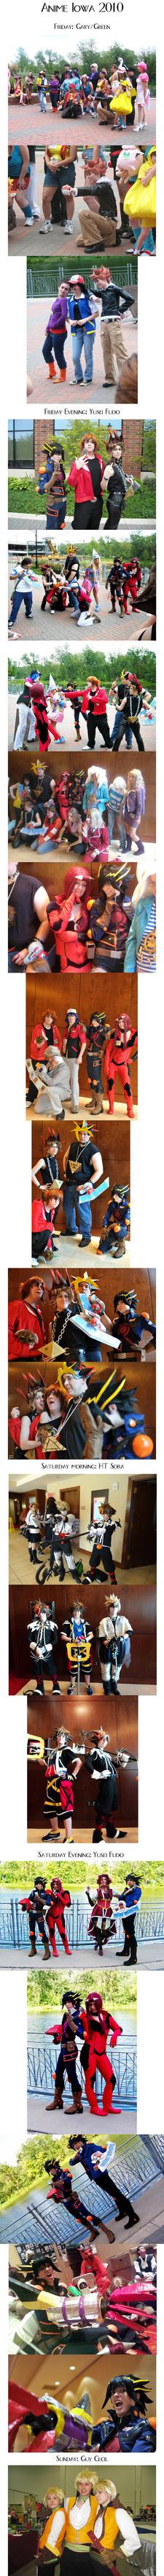 Anime Iowa 2010 by Malindachan